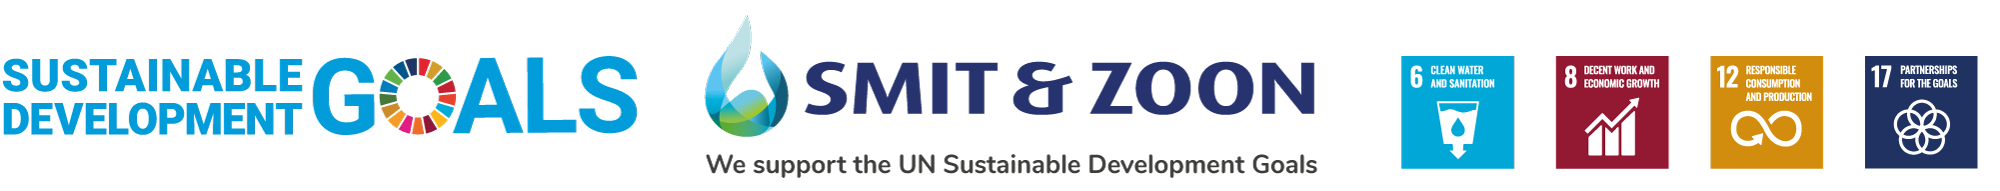 SDG & Smit & Zoon logo.png